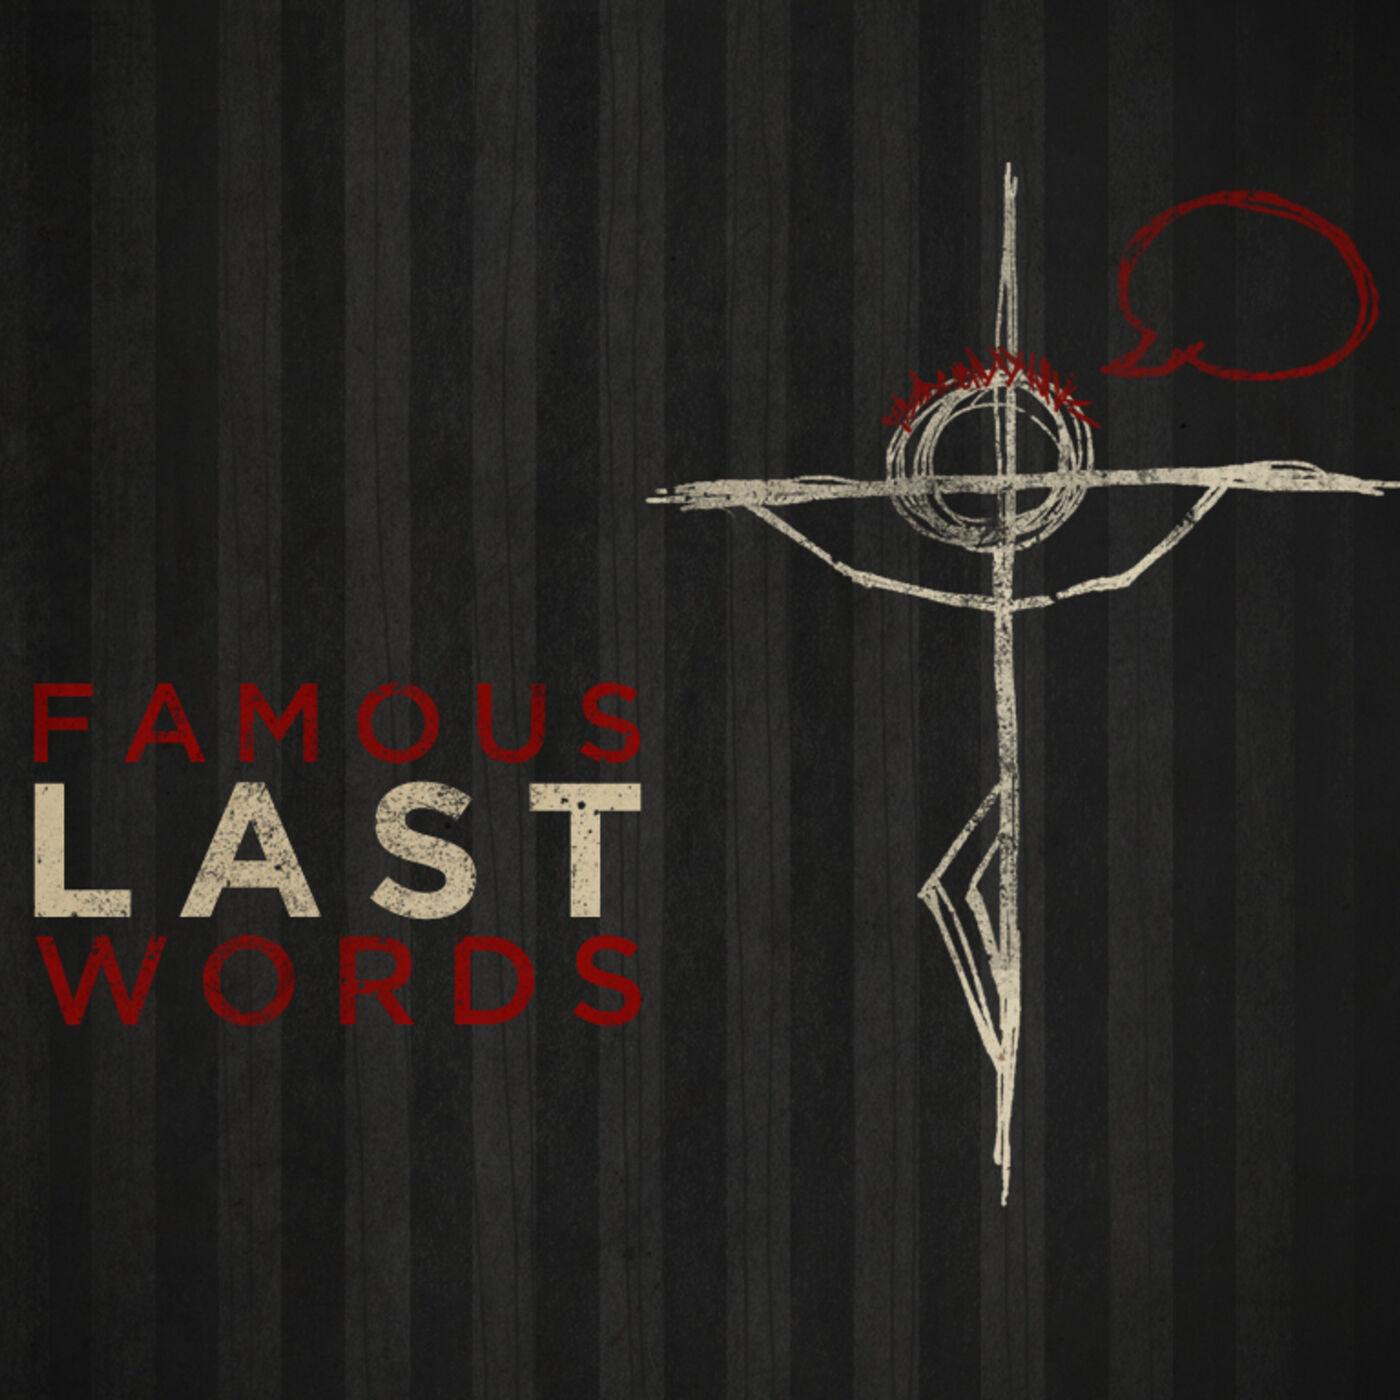 Famous Last Words - Week 2